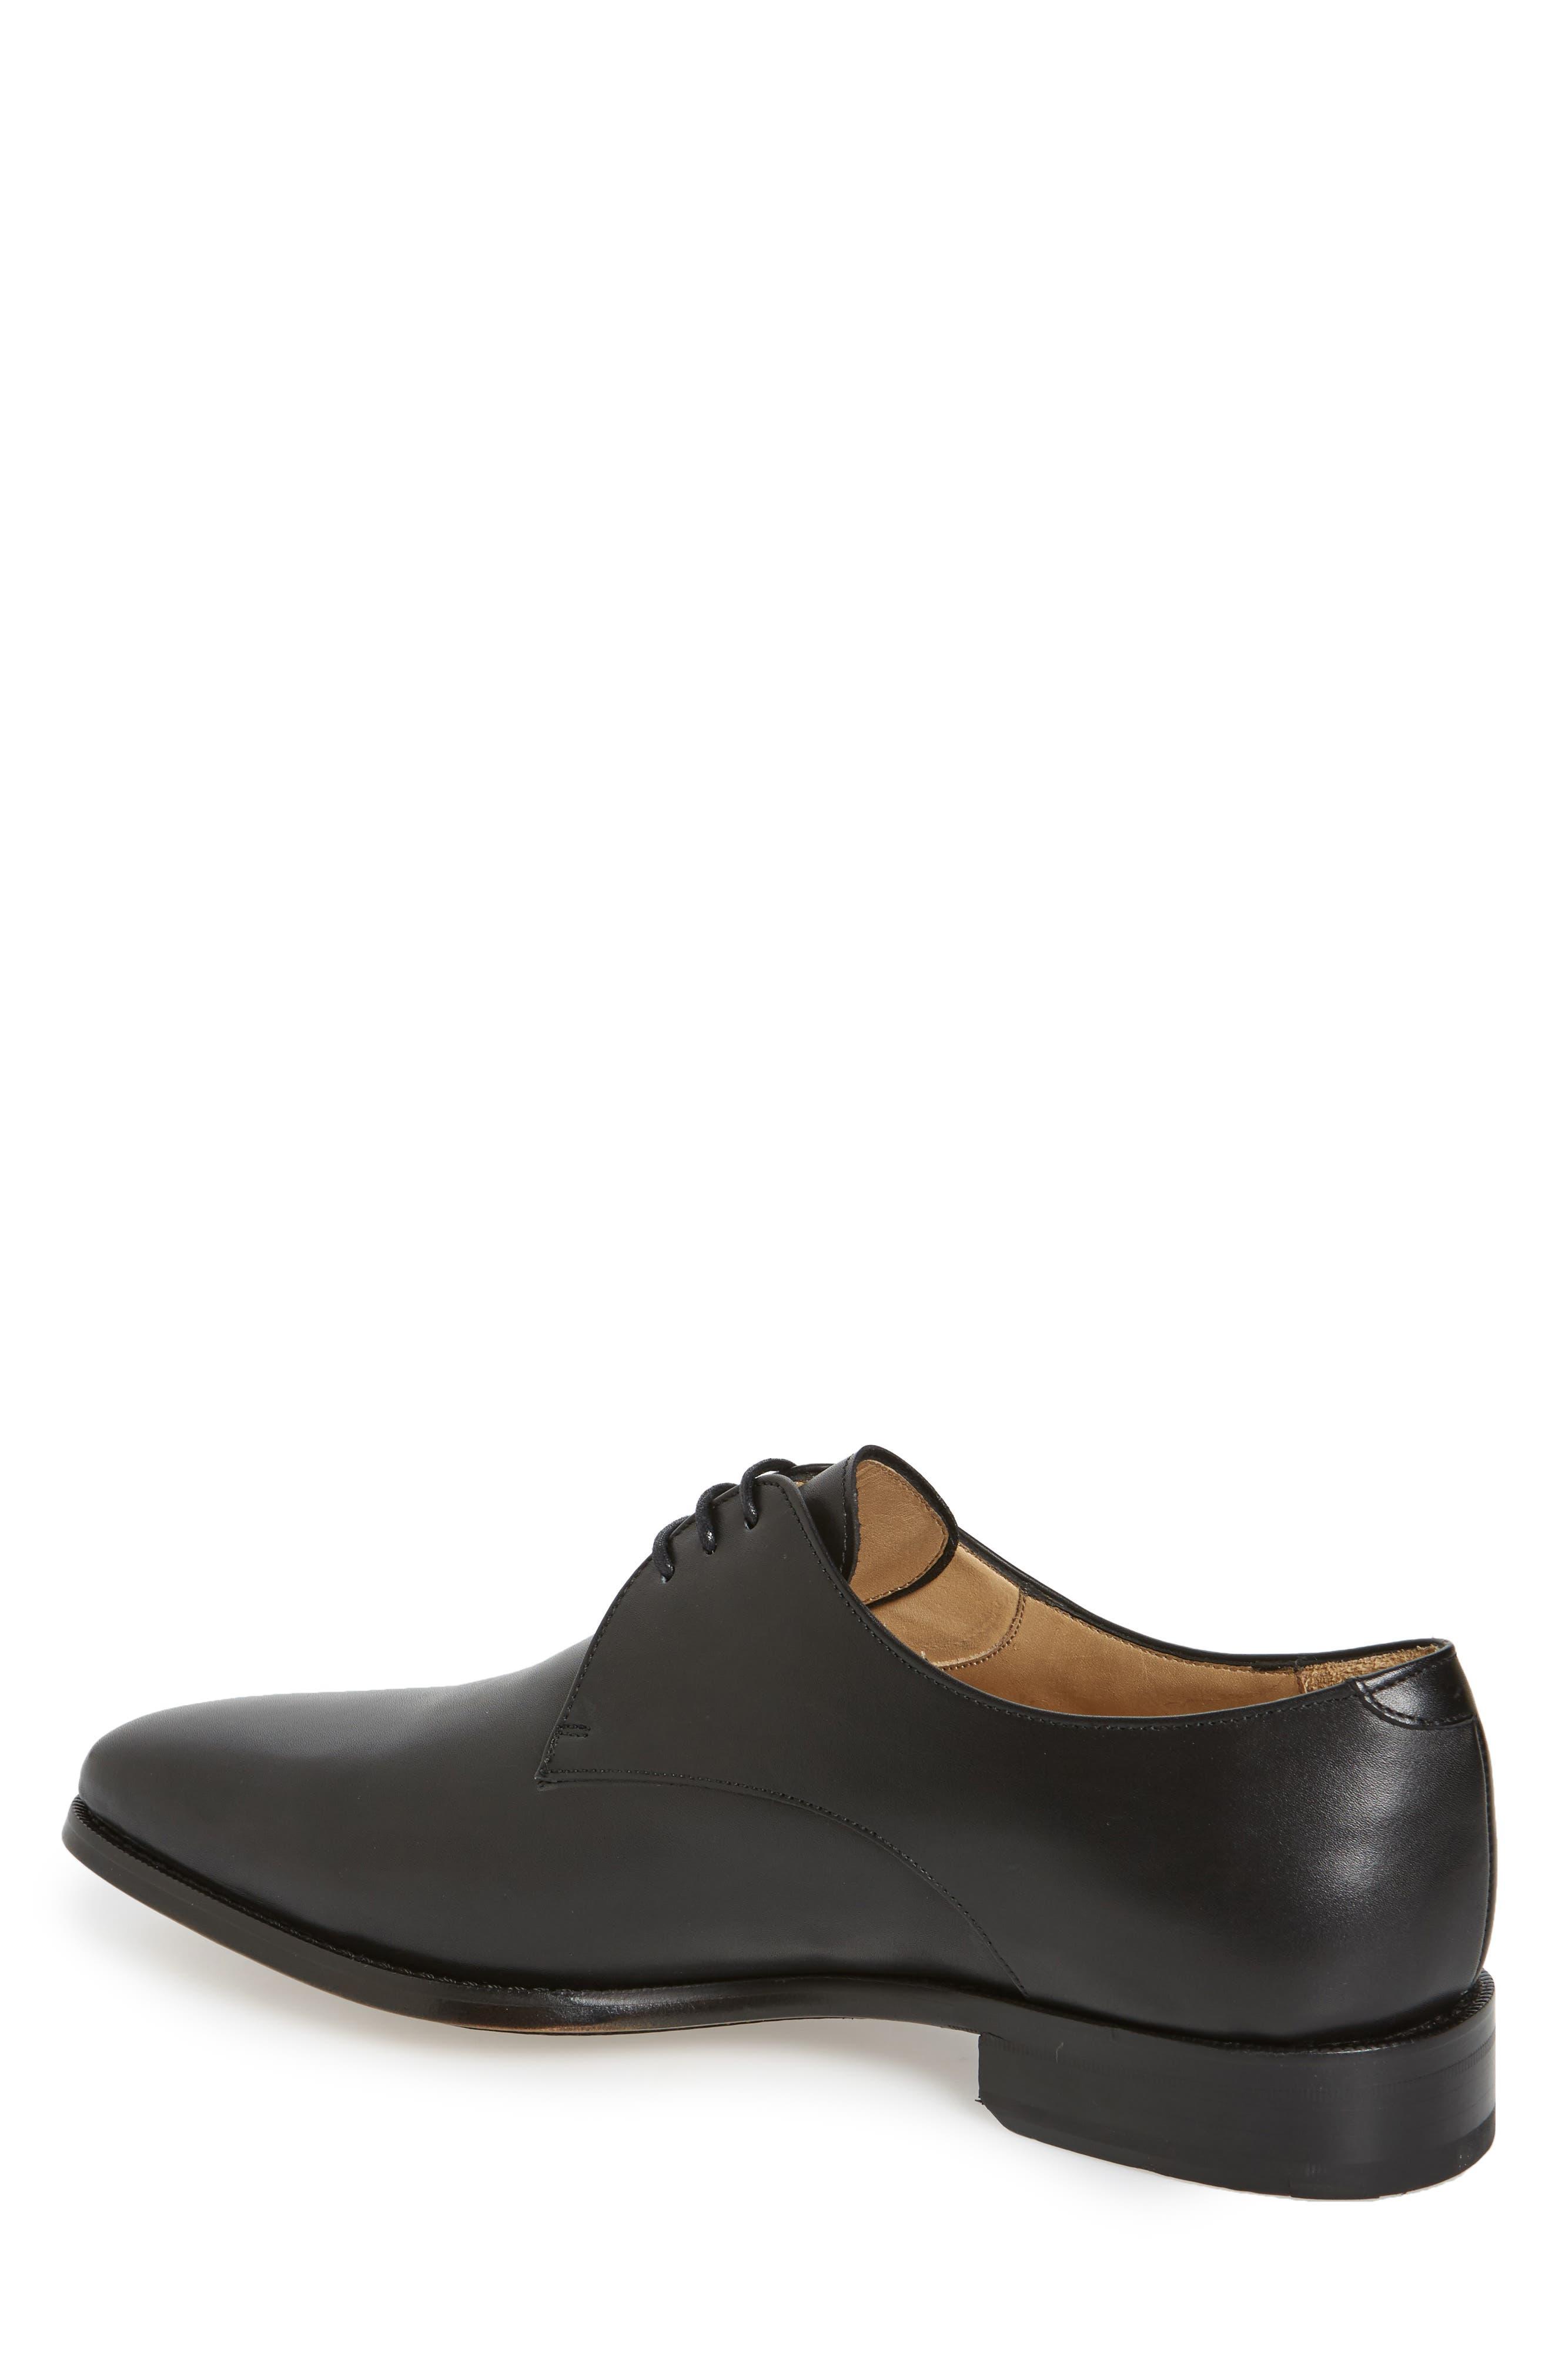 Mitch Plain Toe Derby,                             Alternate thumbnail 2, color,                             Black Leather